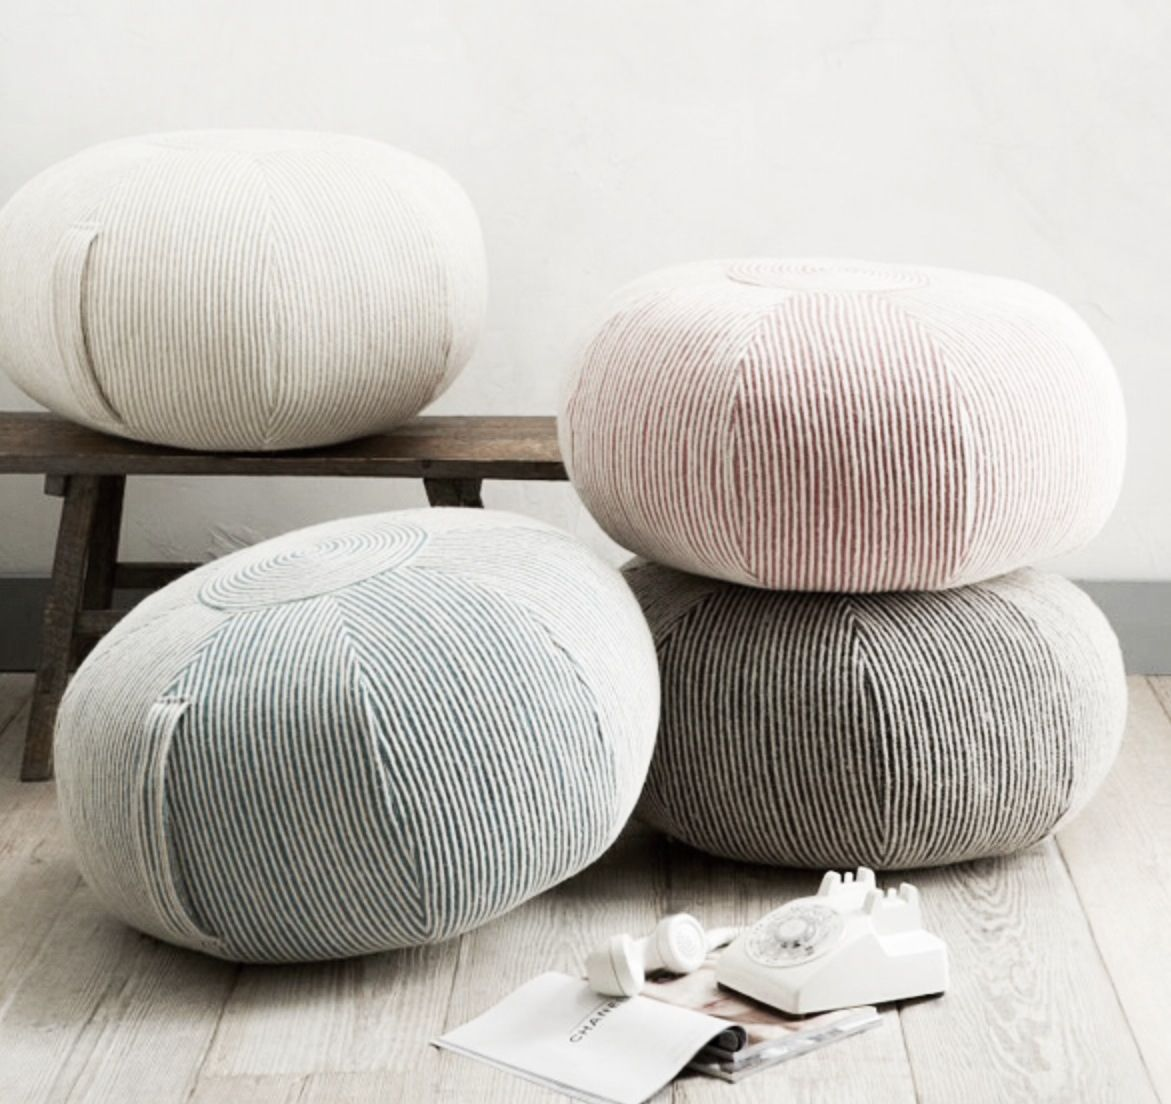 Striped poufs in powdery soft colours   Poufs   Pinterest   Poufs ...